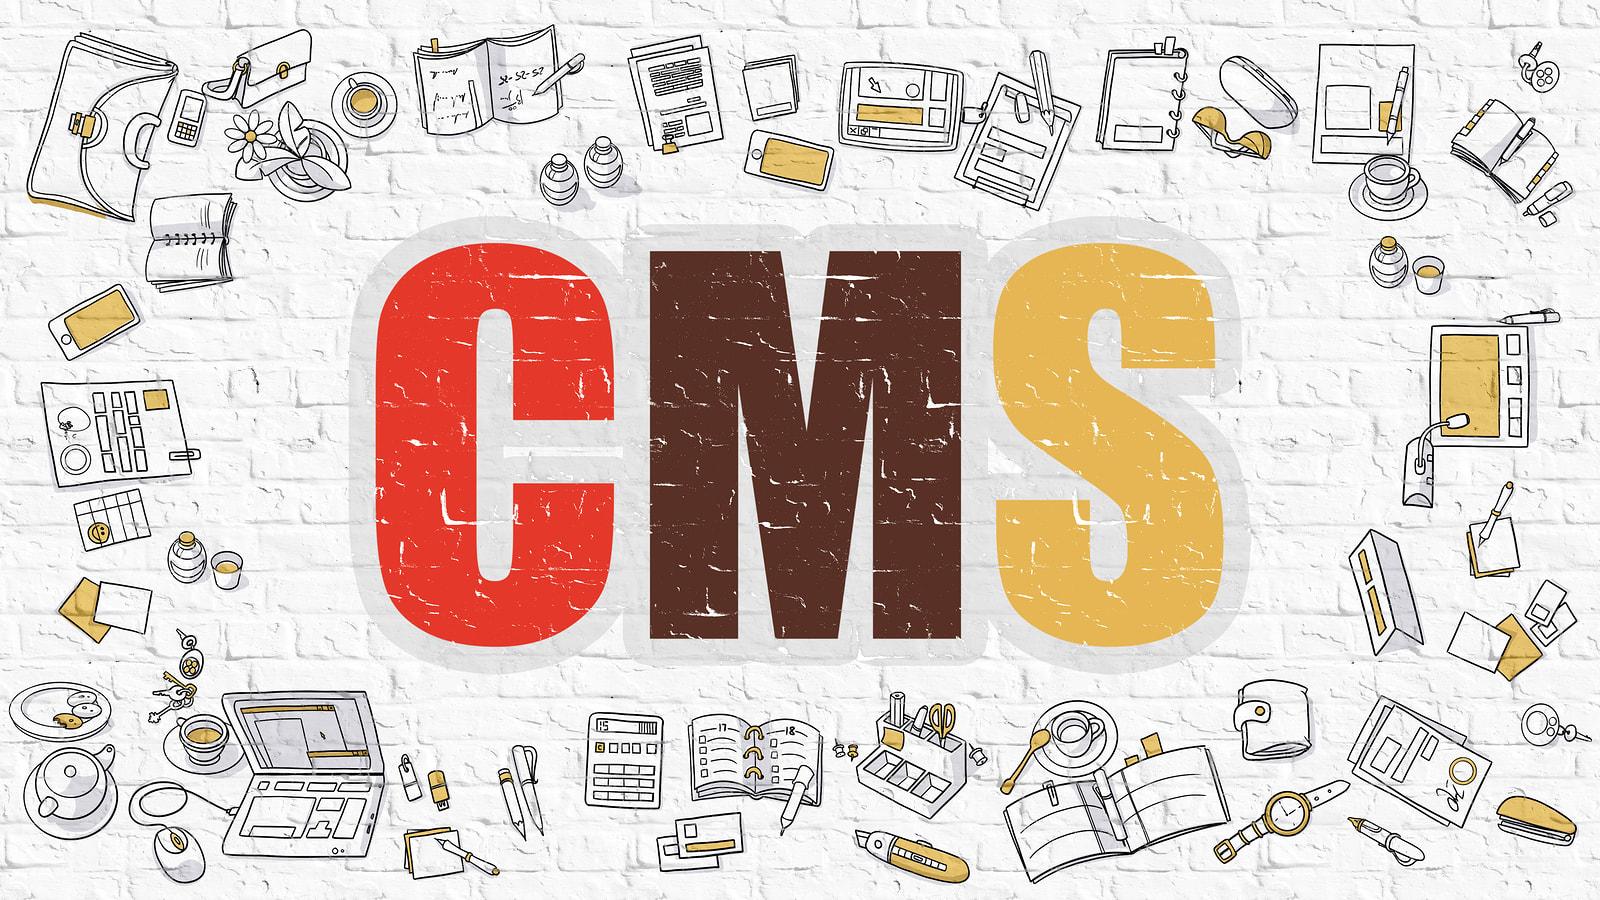 CMS News Round-up - December 19, 2016